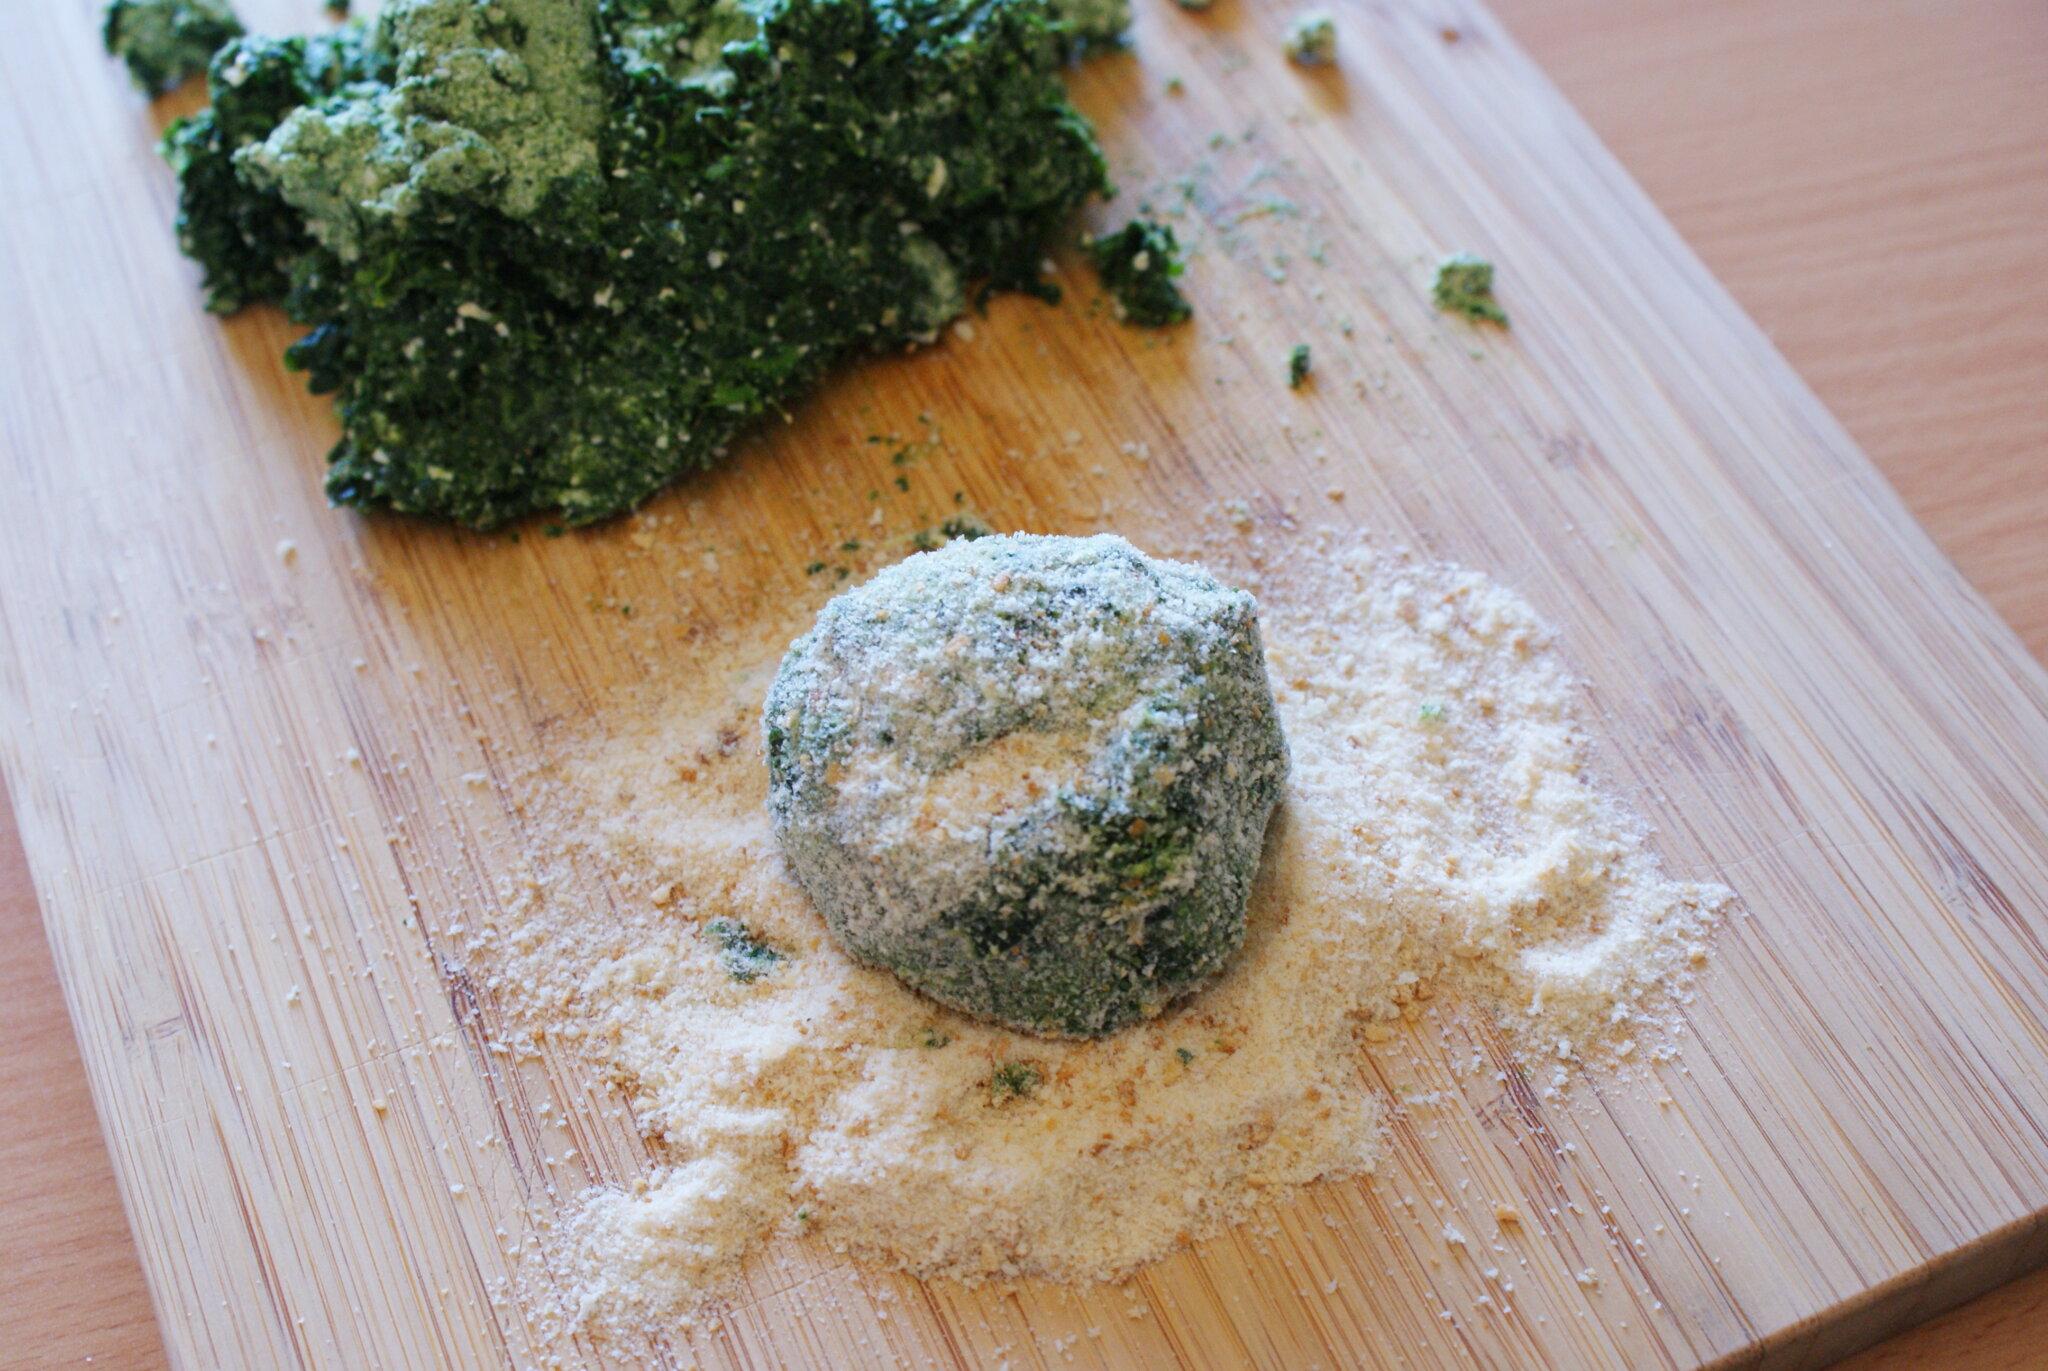 come fare burger verdi spinaci tofu vegani vegetariani ricetta afcile veloce